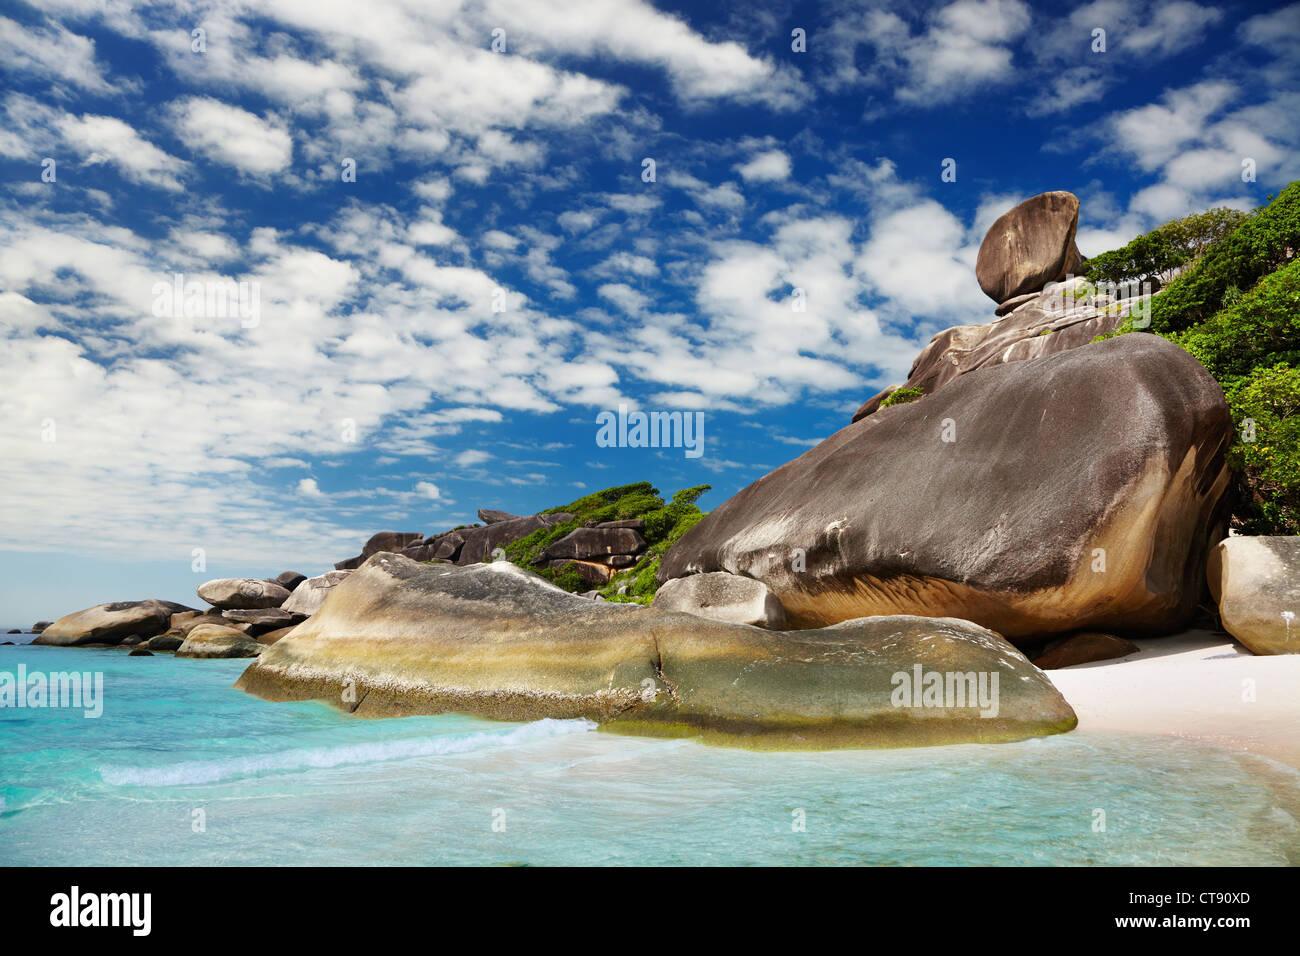 Tropical beach, Similan islands, Andaman Sea, Thailand - Stock Image